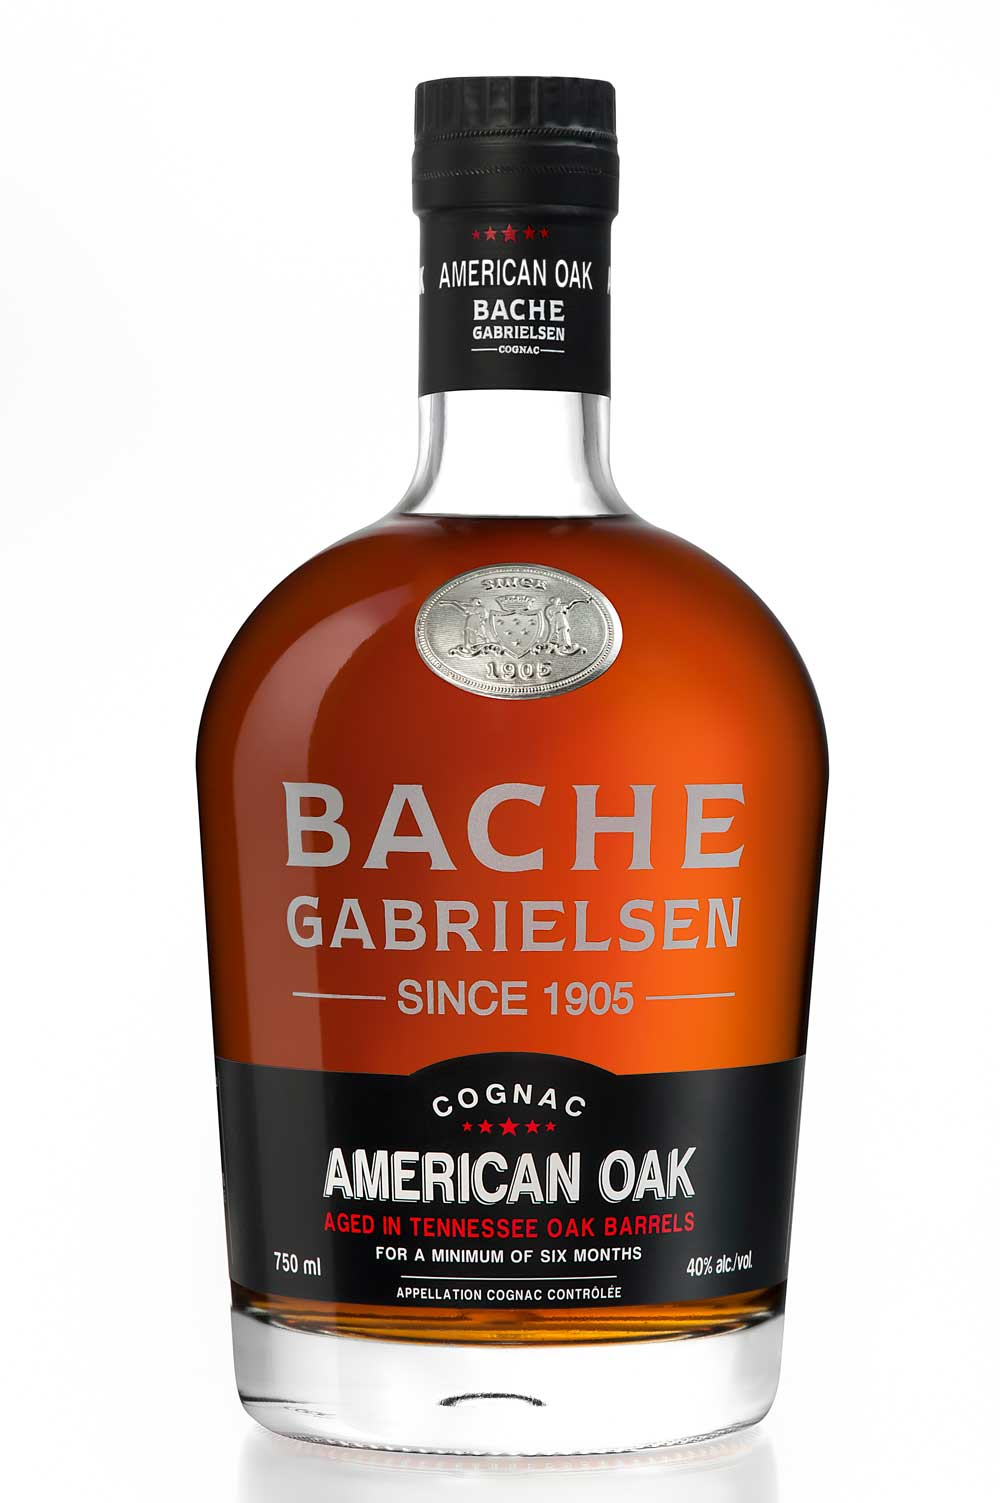 American Oak - Bache Gabrielsen